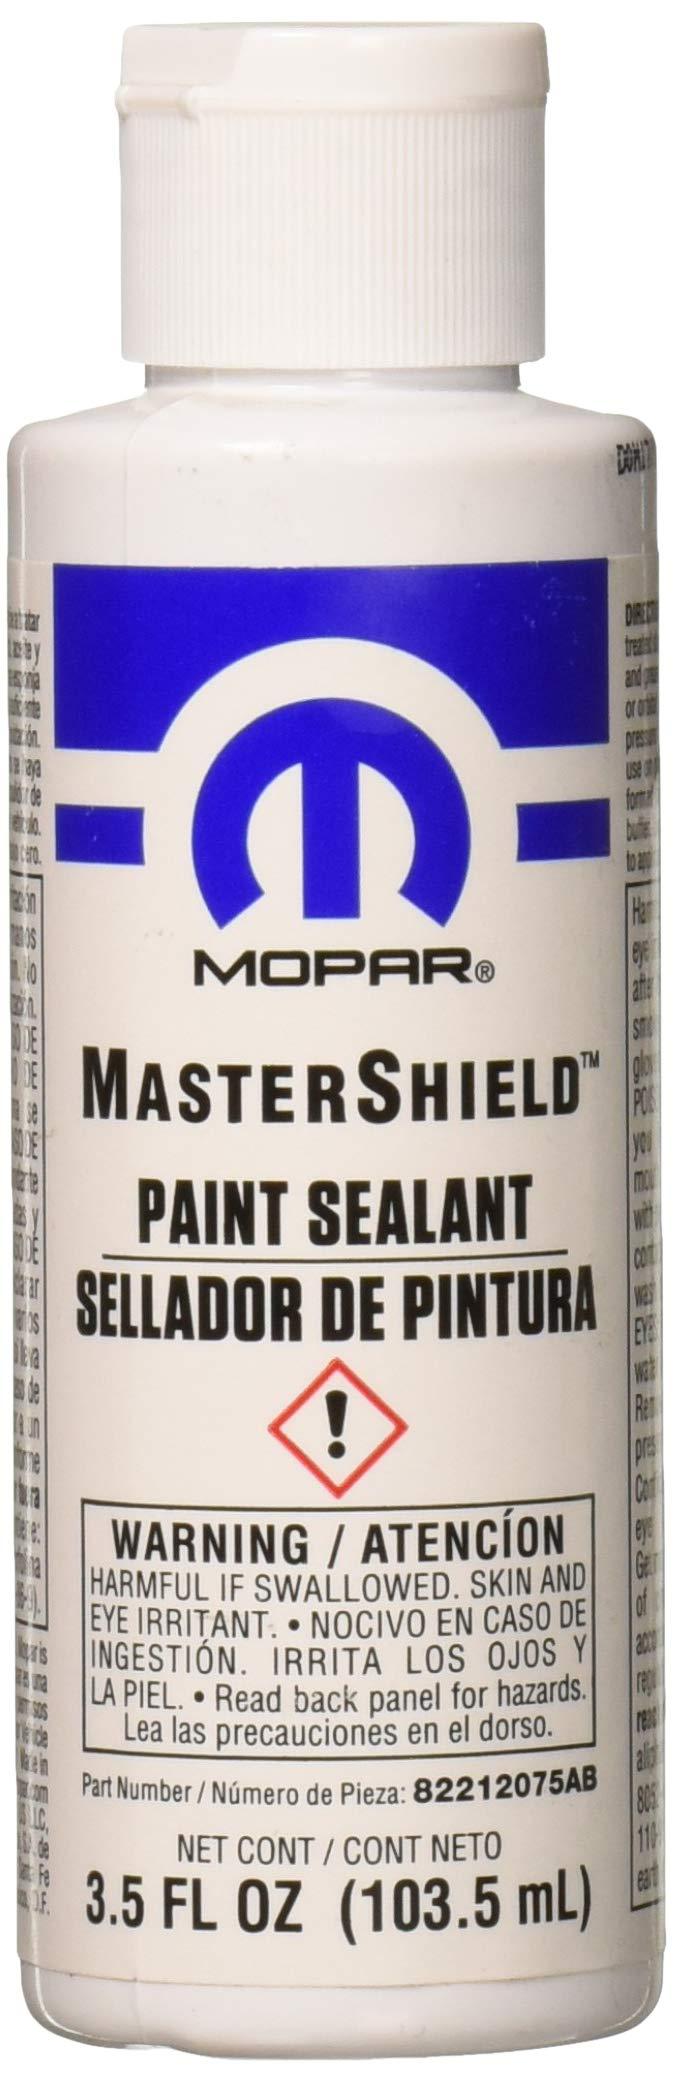 Chrysler Genuine 82212075 Paint Sealant - 4 oz.